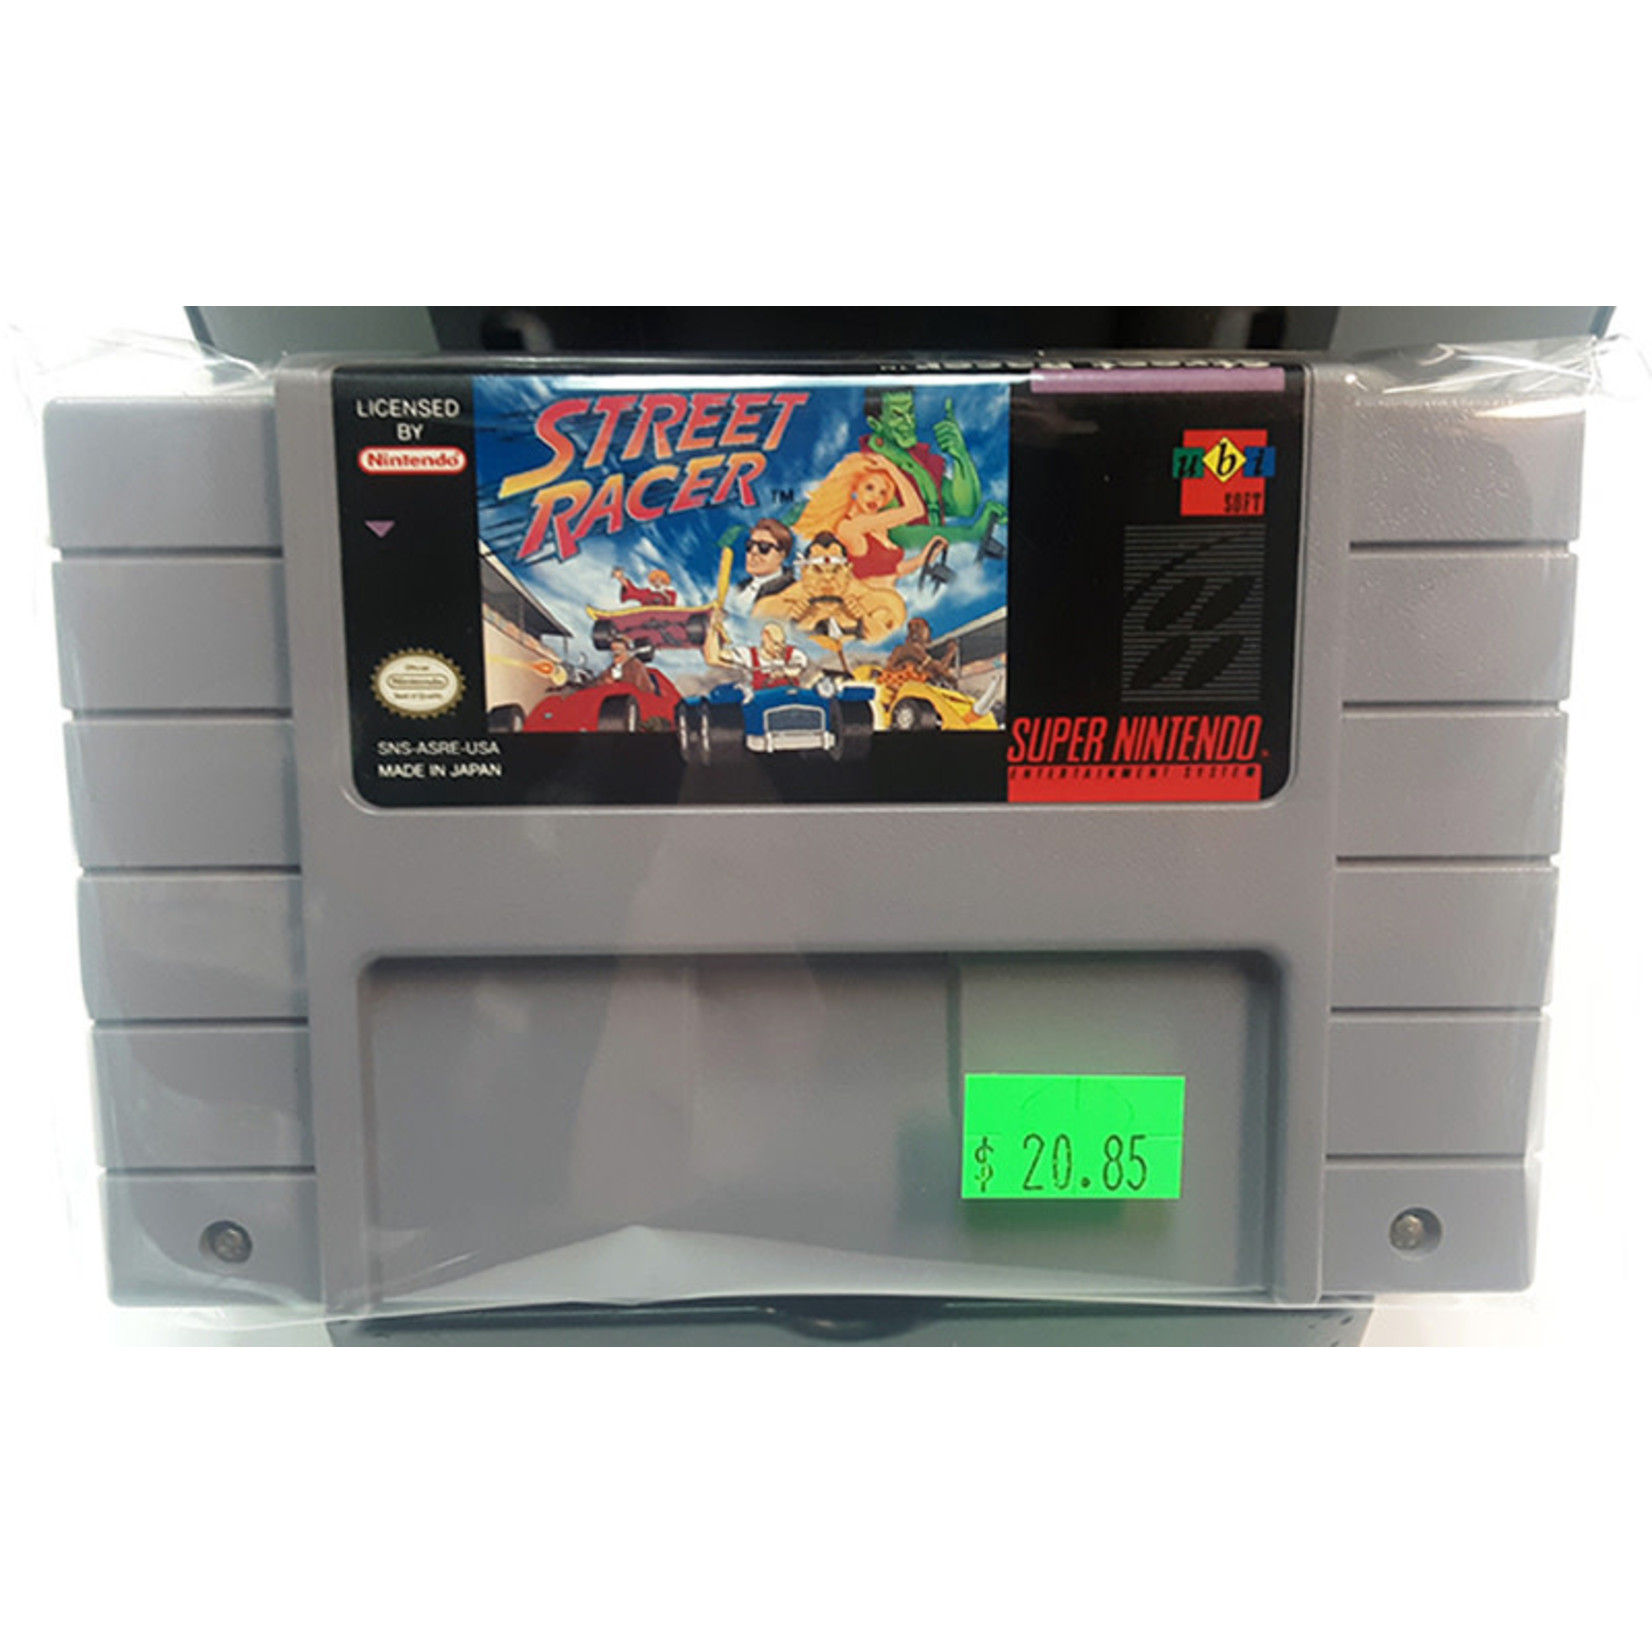 SNESu-Street Racer (cartridge)